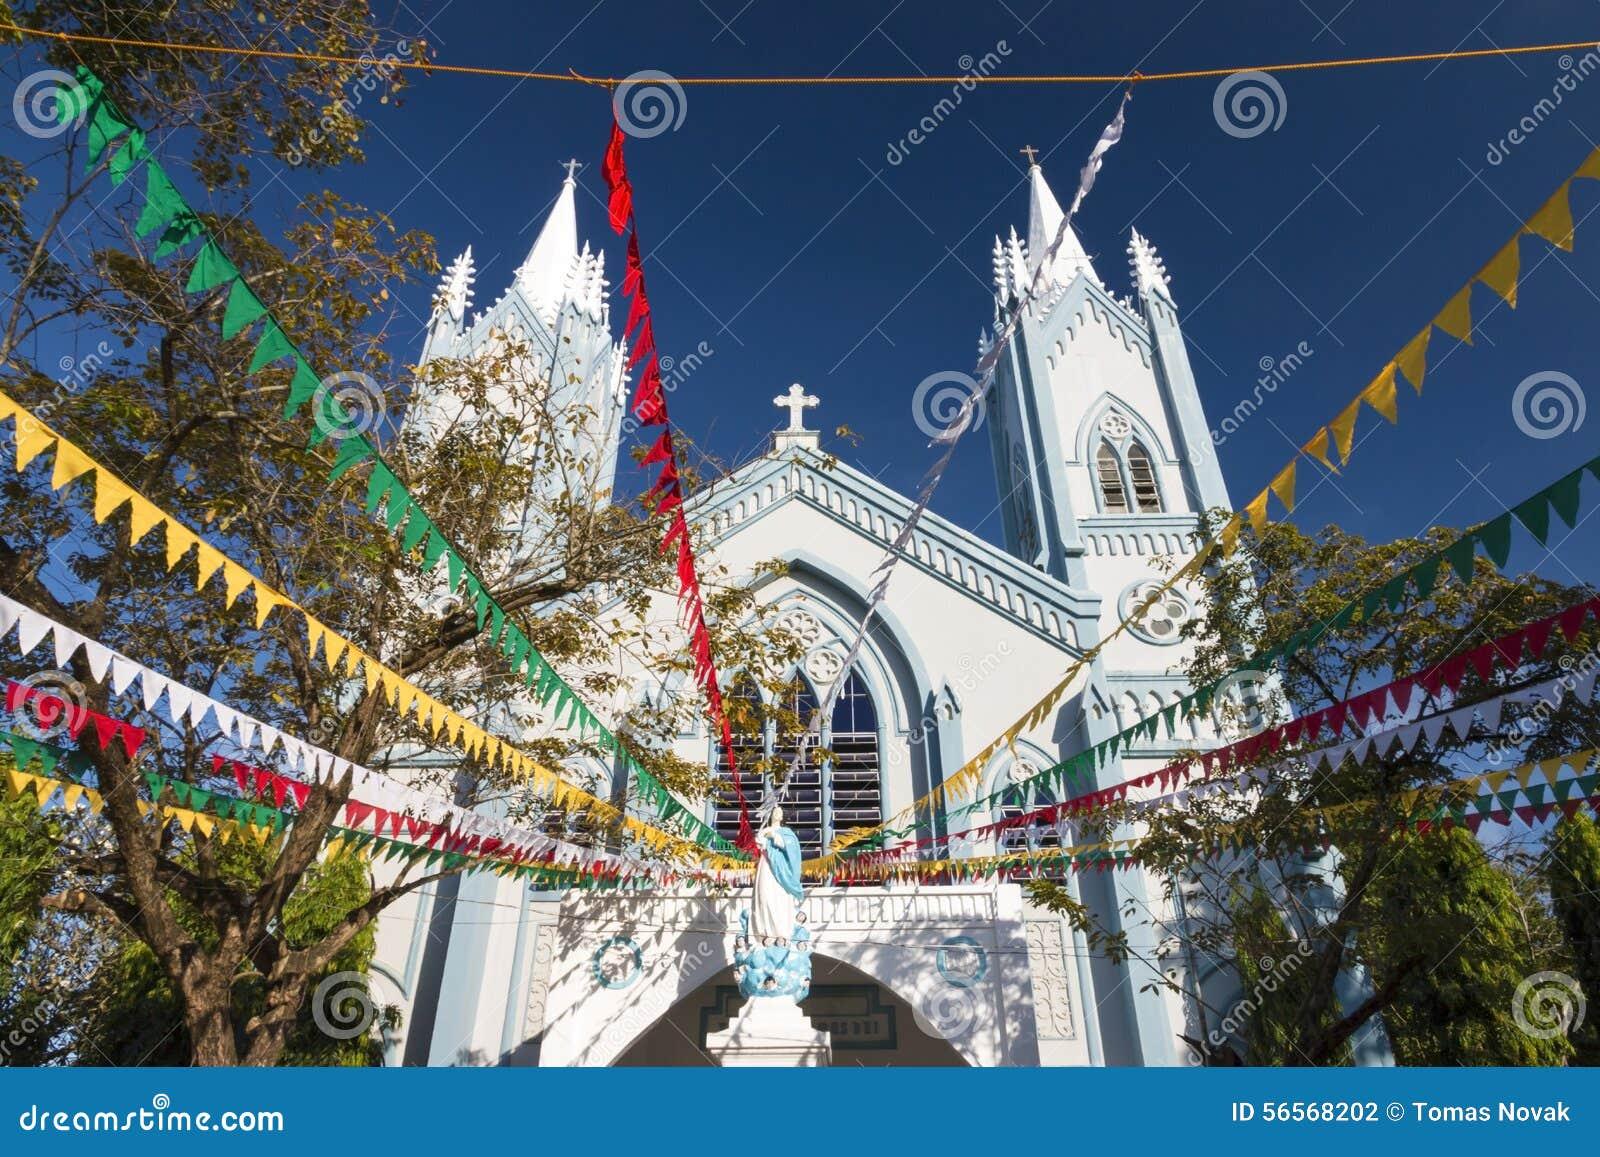 Download Αμόλυντος καθεδρικός ναός σύλληψης κατά τη διάρκεια του χρόνου Chritmas Στοκ Εικόνες - εικόνα από σταυρός, μακριά: 56568202